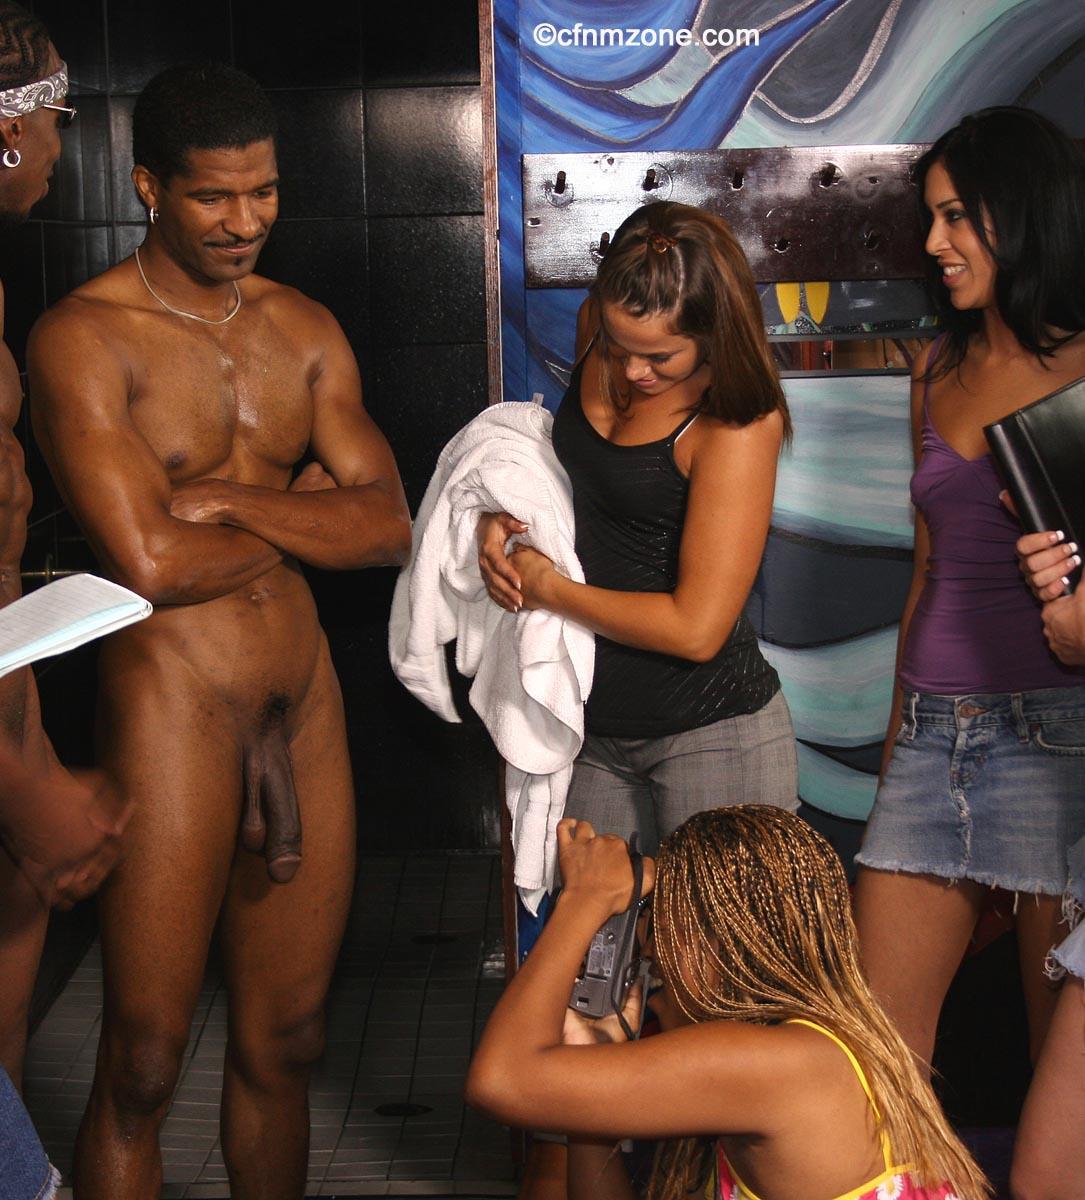 Cfnm conventional reporter interview porn actors on set